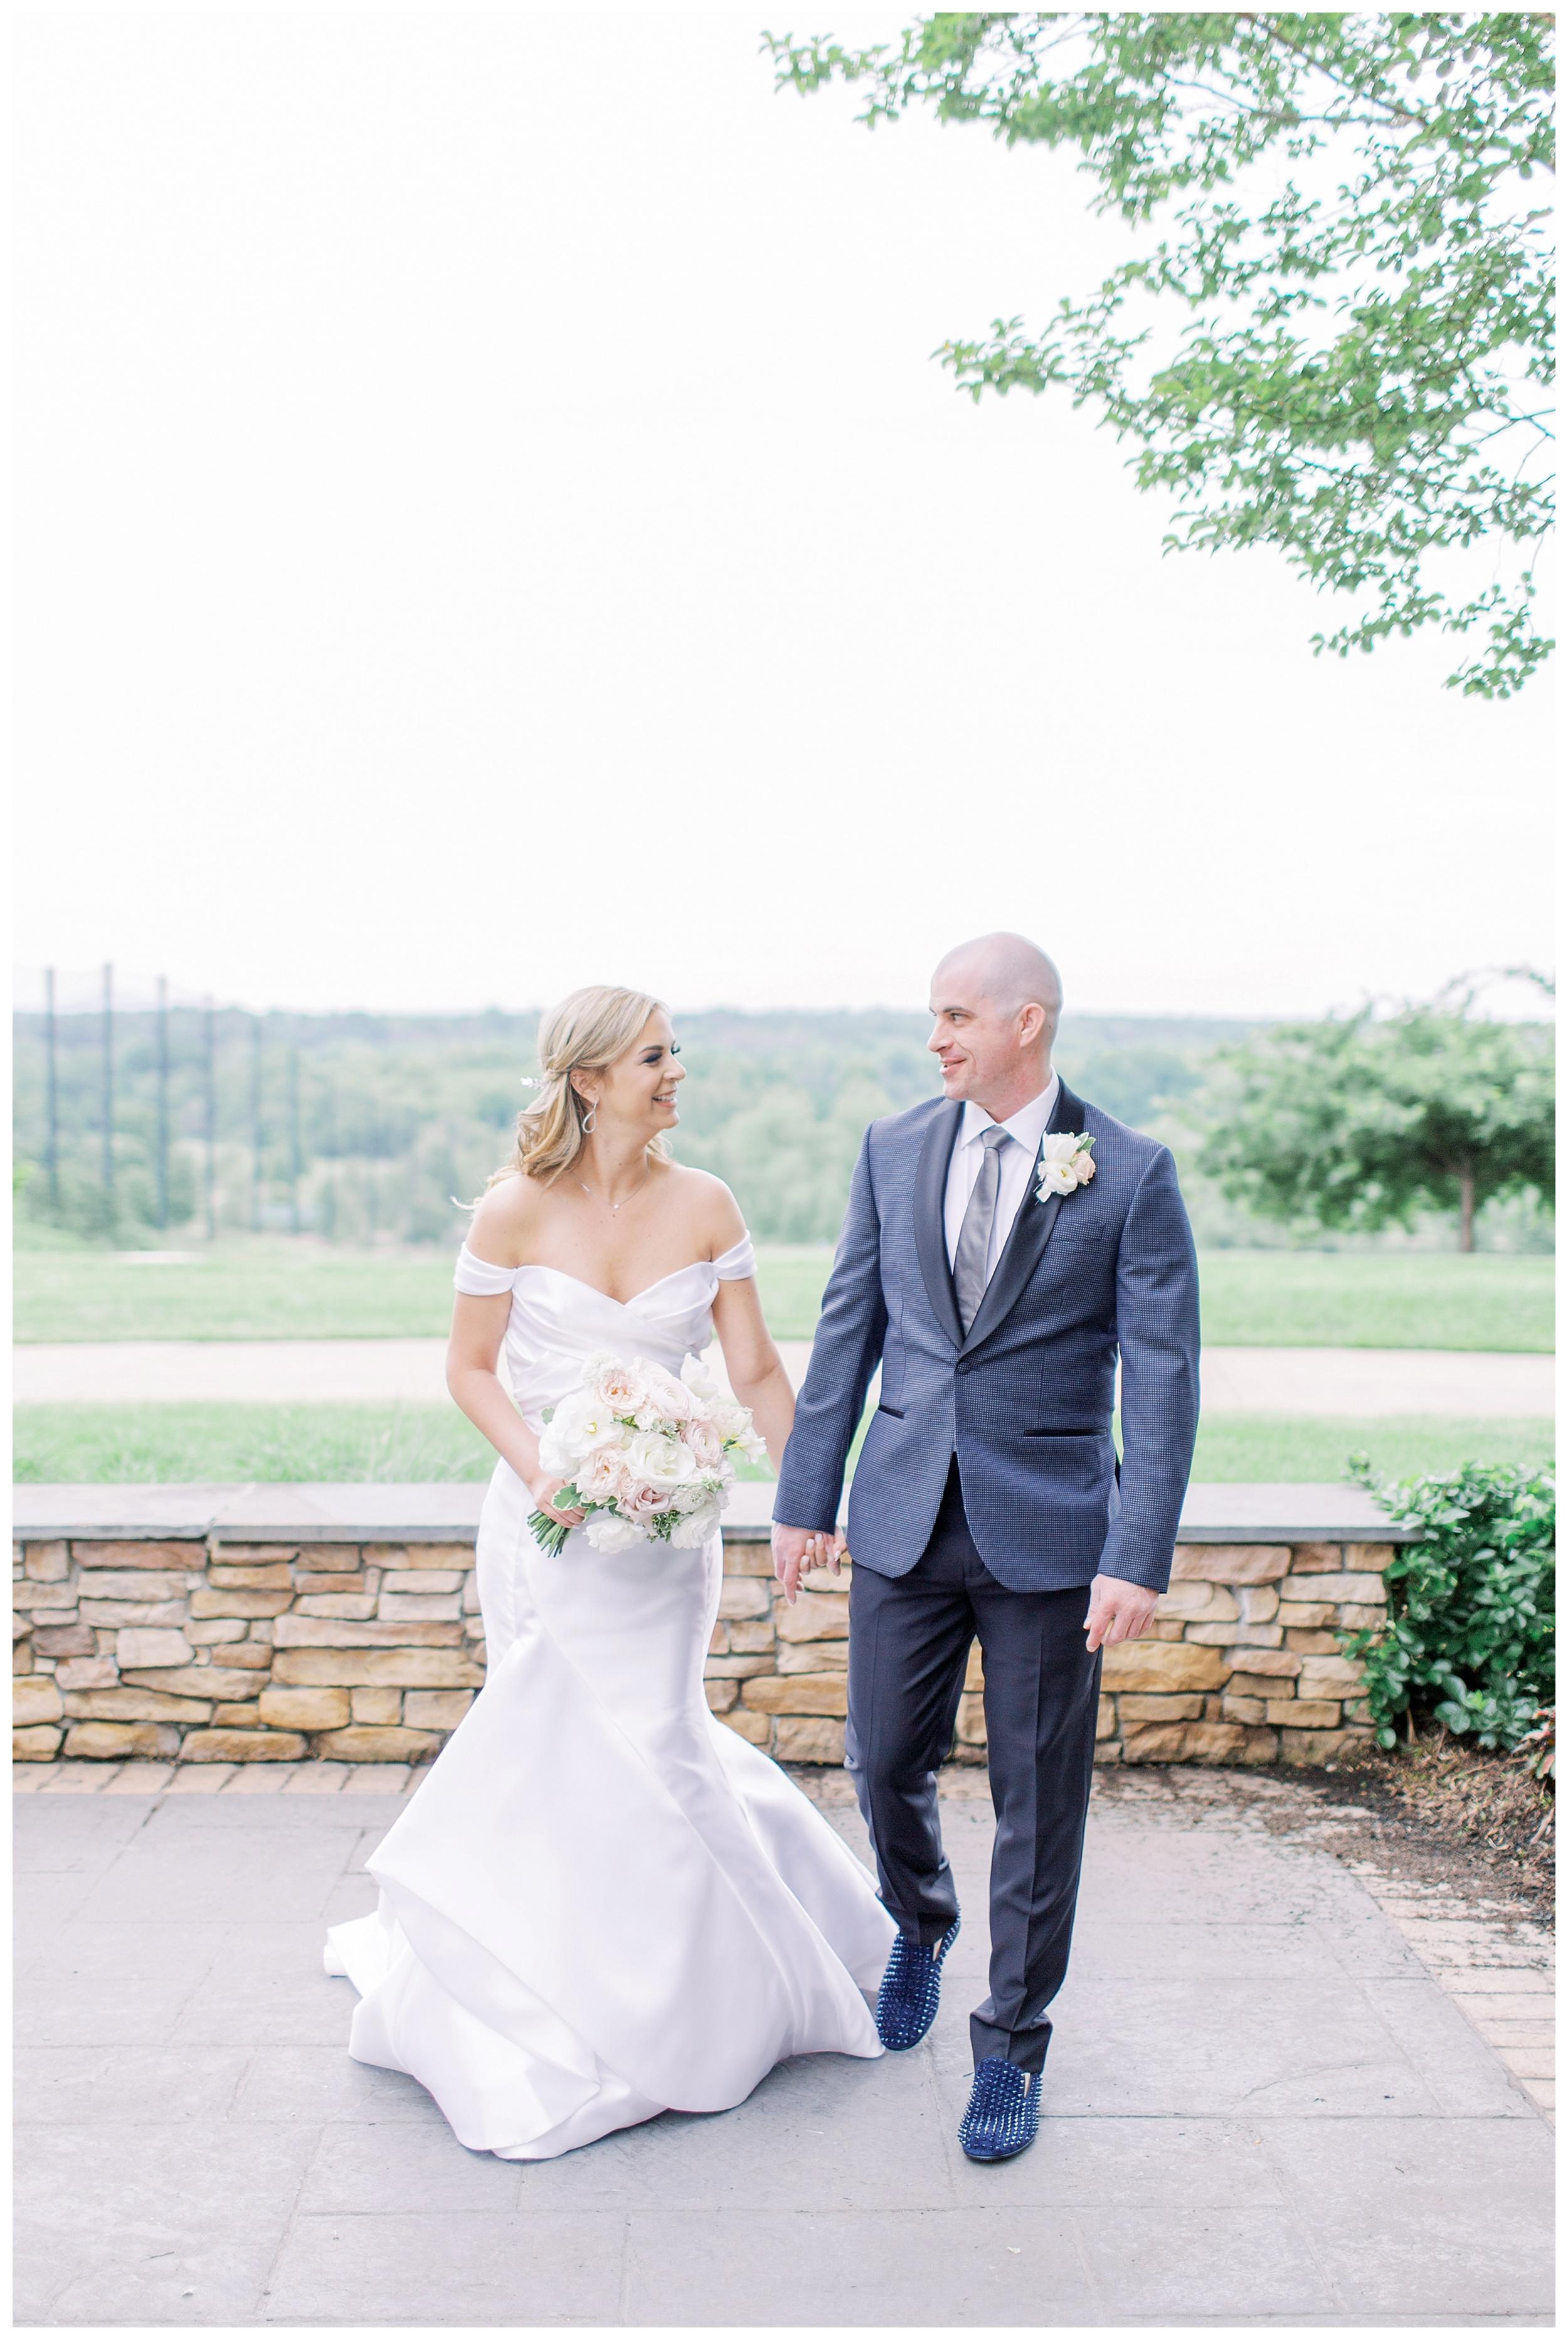 Lansdowne Resort Wedding | Virginia Film Wedding Photographer Kir Tuben_0035.jpg